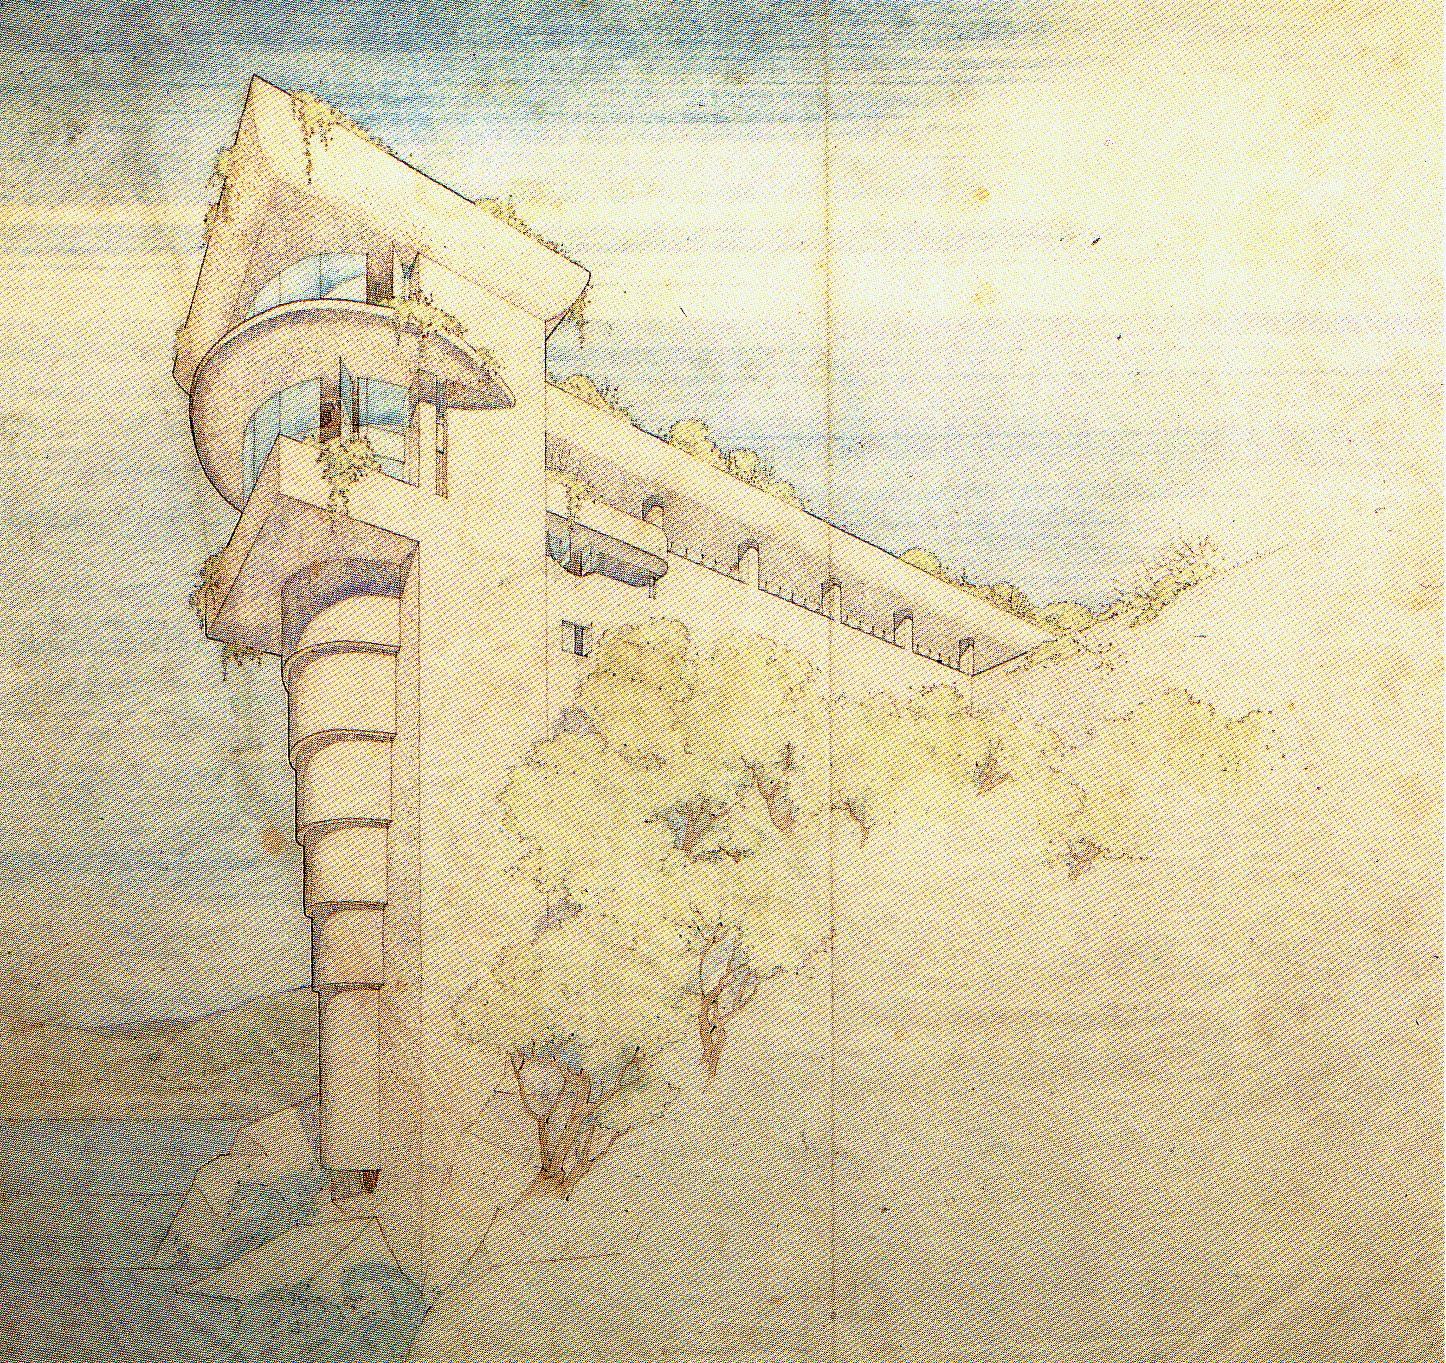 Morris House - Unbuilt - Sketch by Frank Lloyd Wright